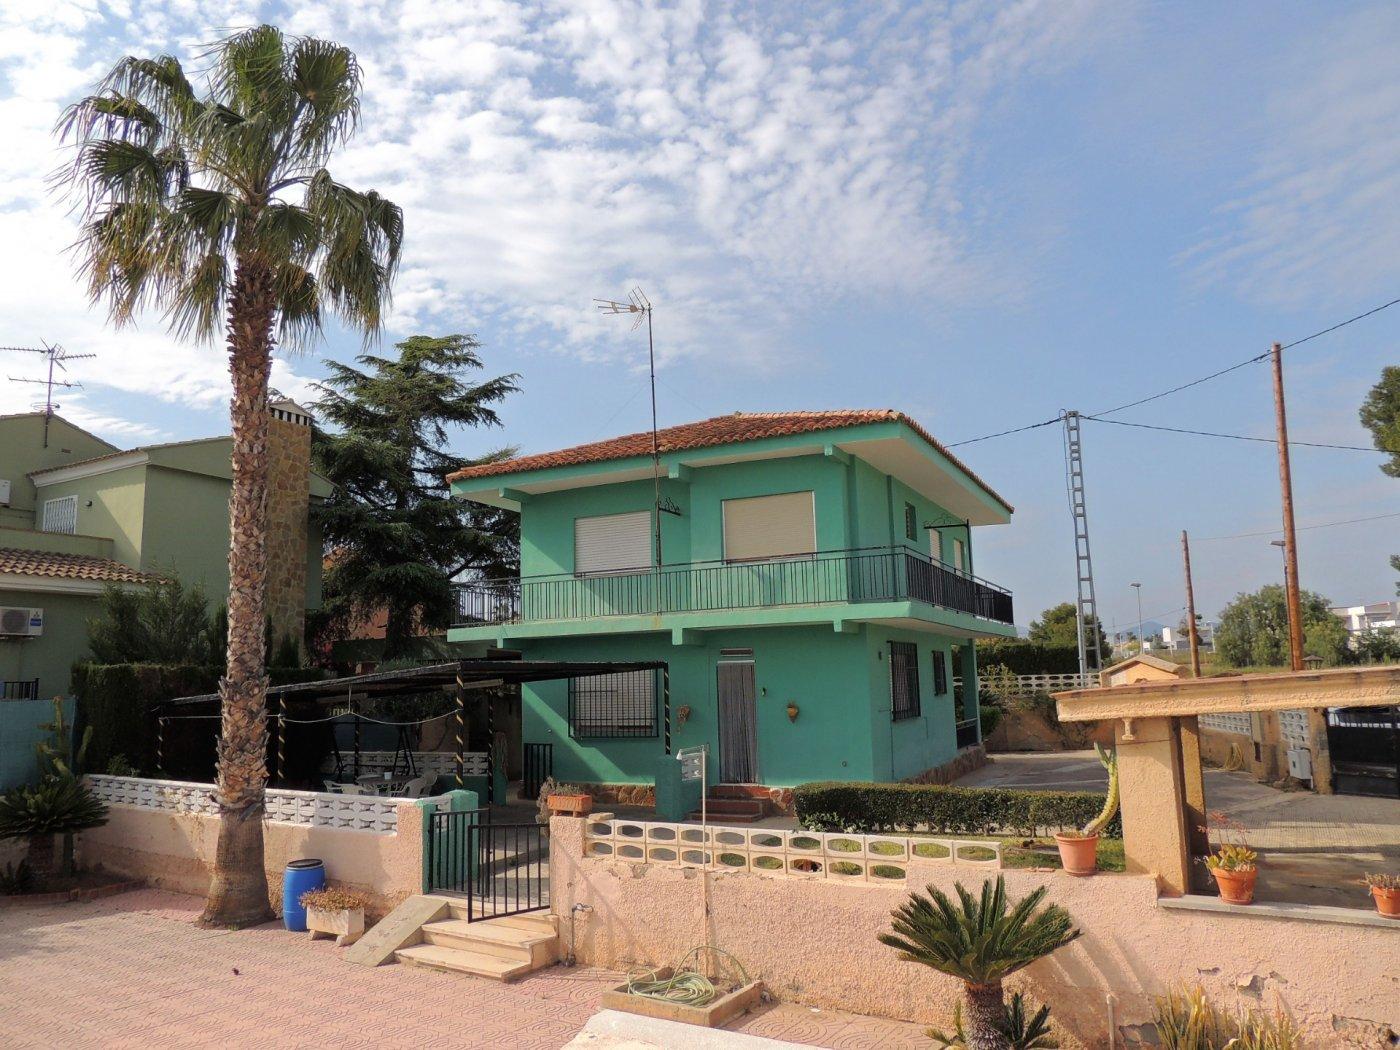 Vendido de Chalet en Moncada